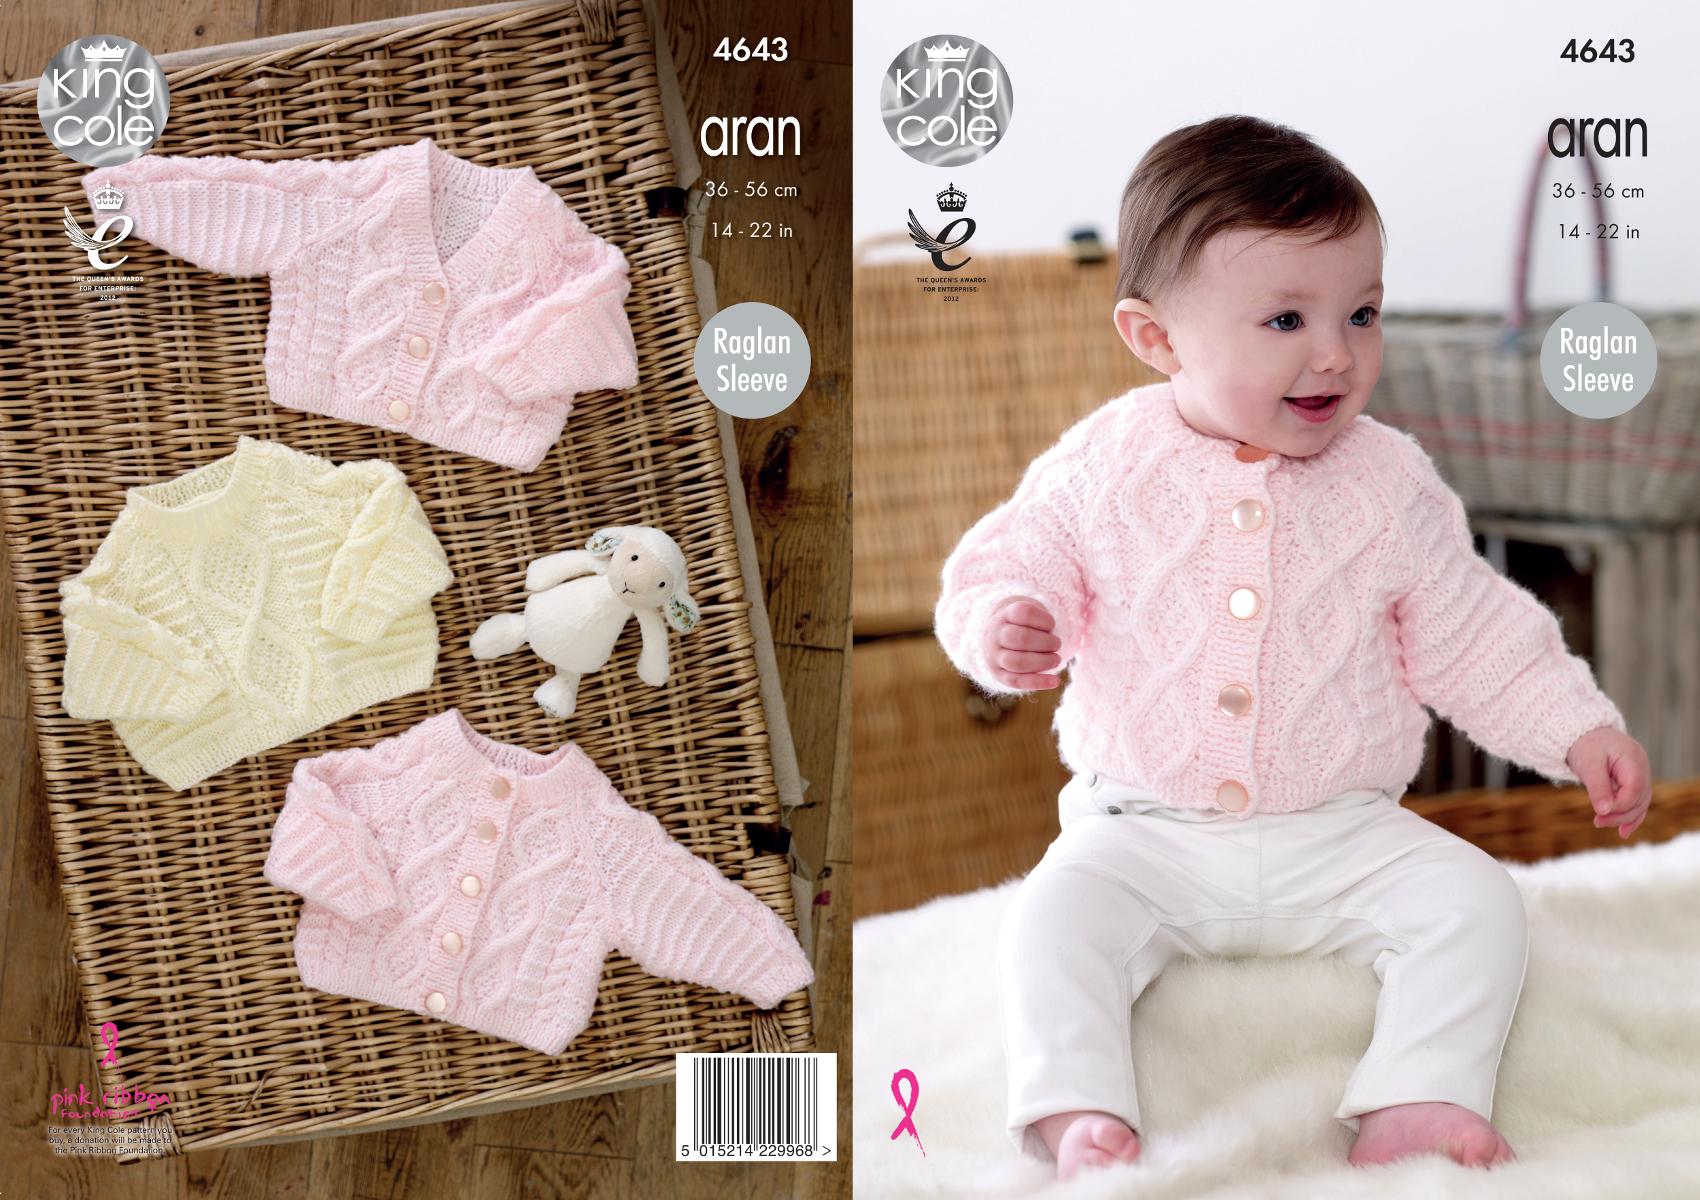 Knitting Pattern King Cole Baby Aran Raglan Sleeve Cabled Cardigans Jumper 46...